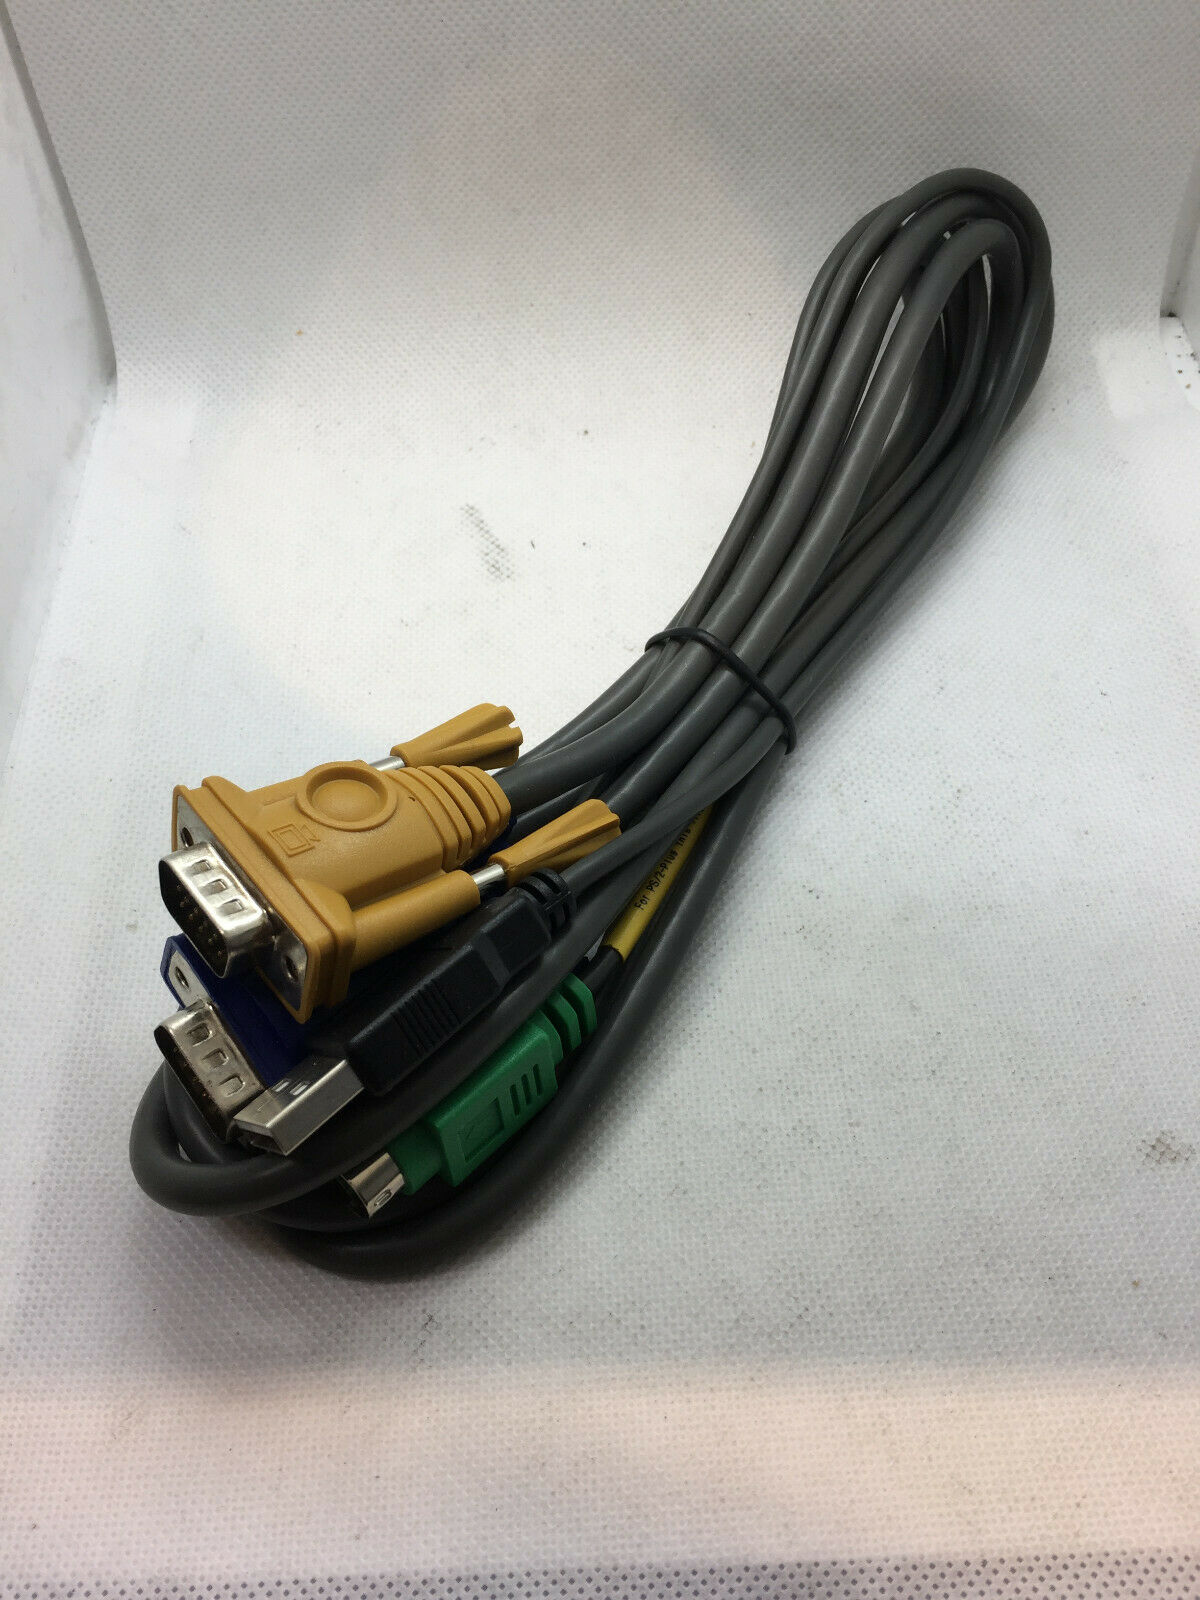 Port USB Display Port Cable KVM CABLE NEW SEALED UK SELLER FREE P&P #B51